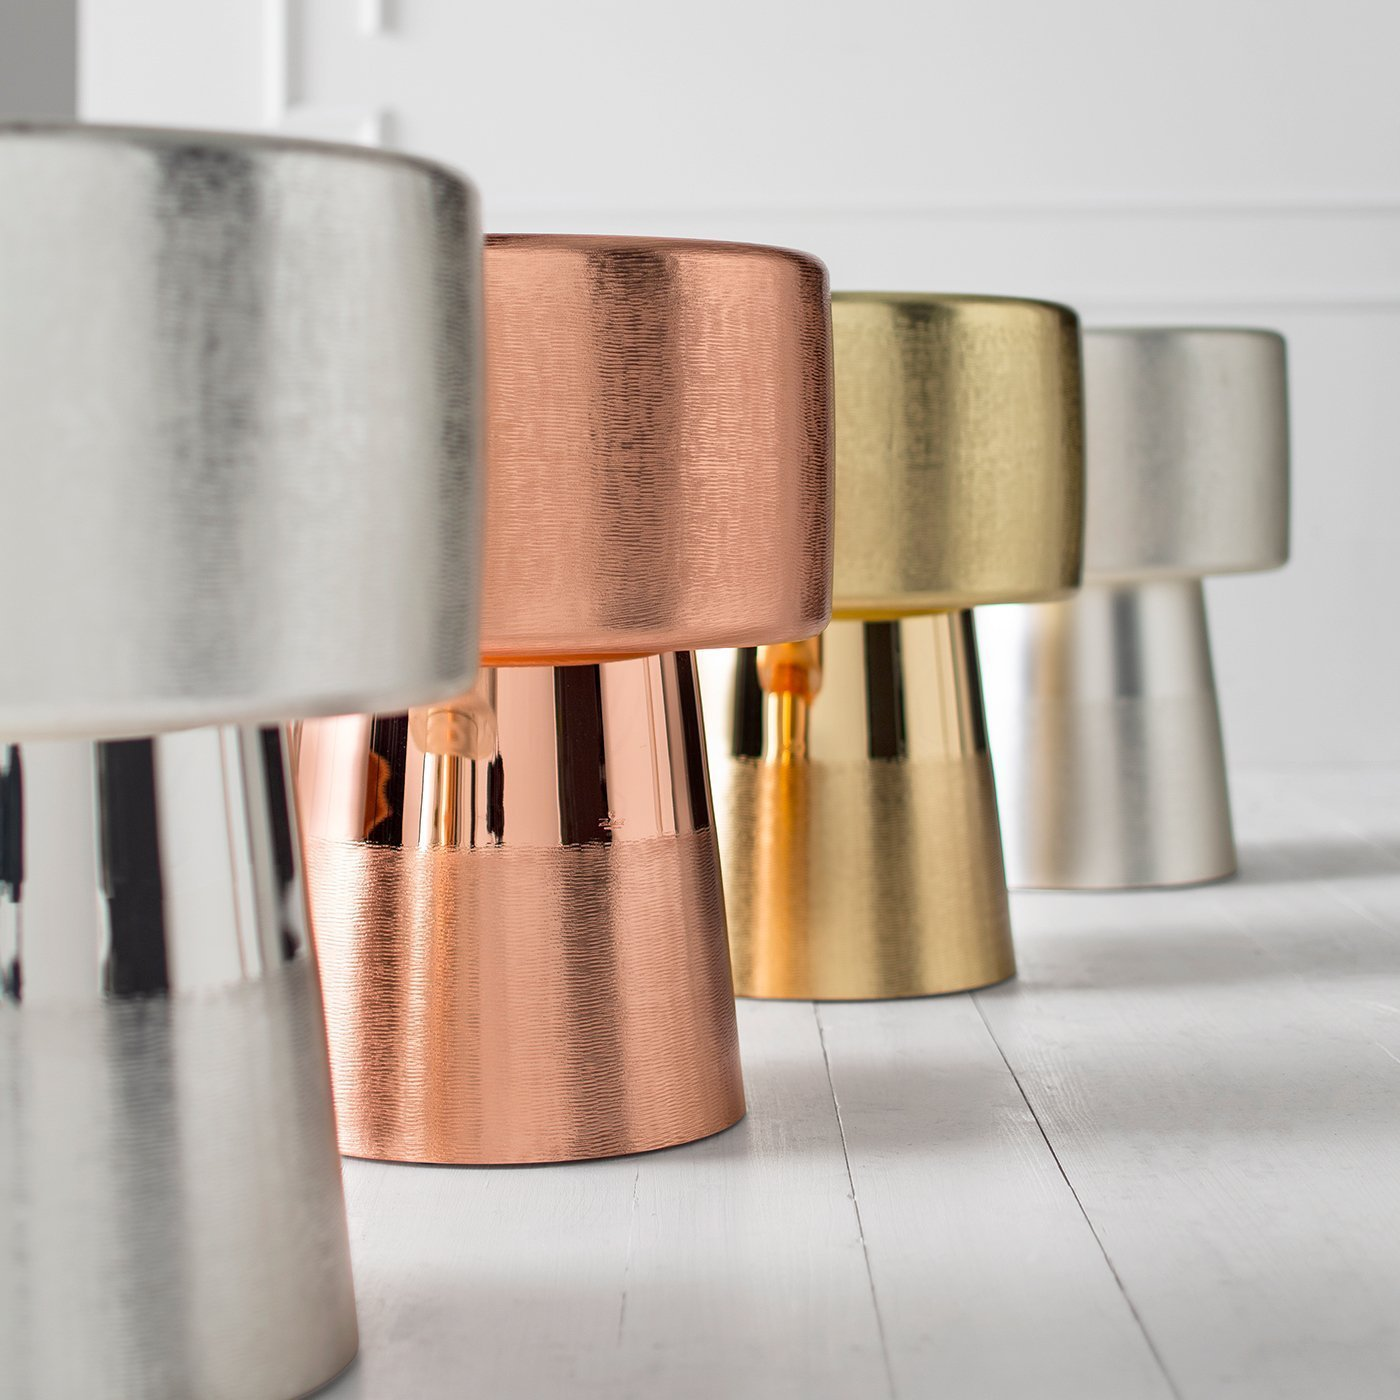 sgabello-design-da-bar-o-da-cucina-tappo-zanetto-2